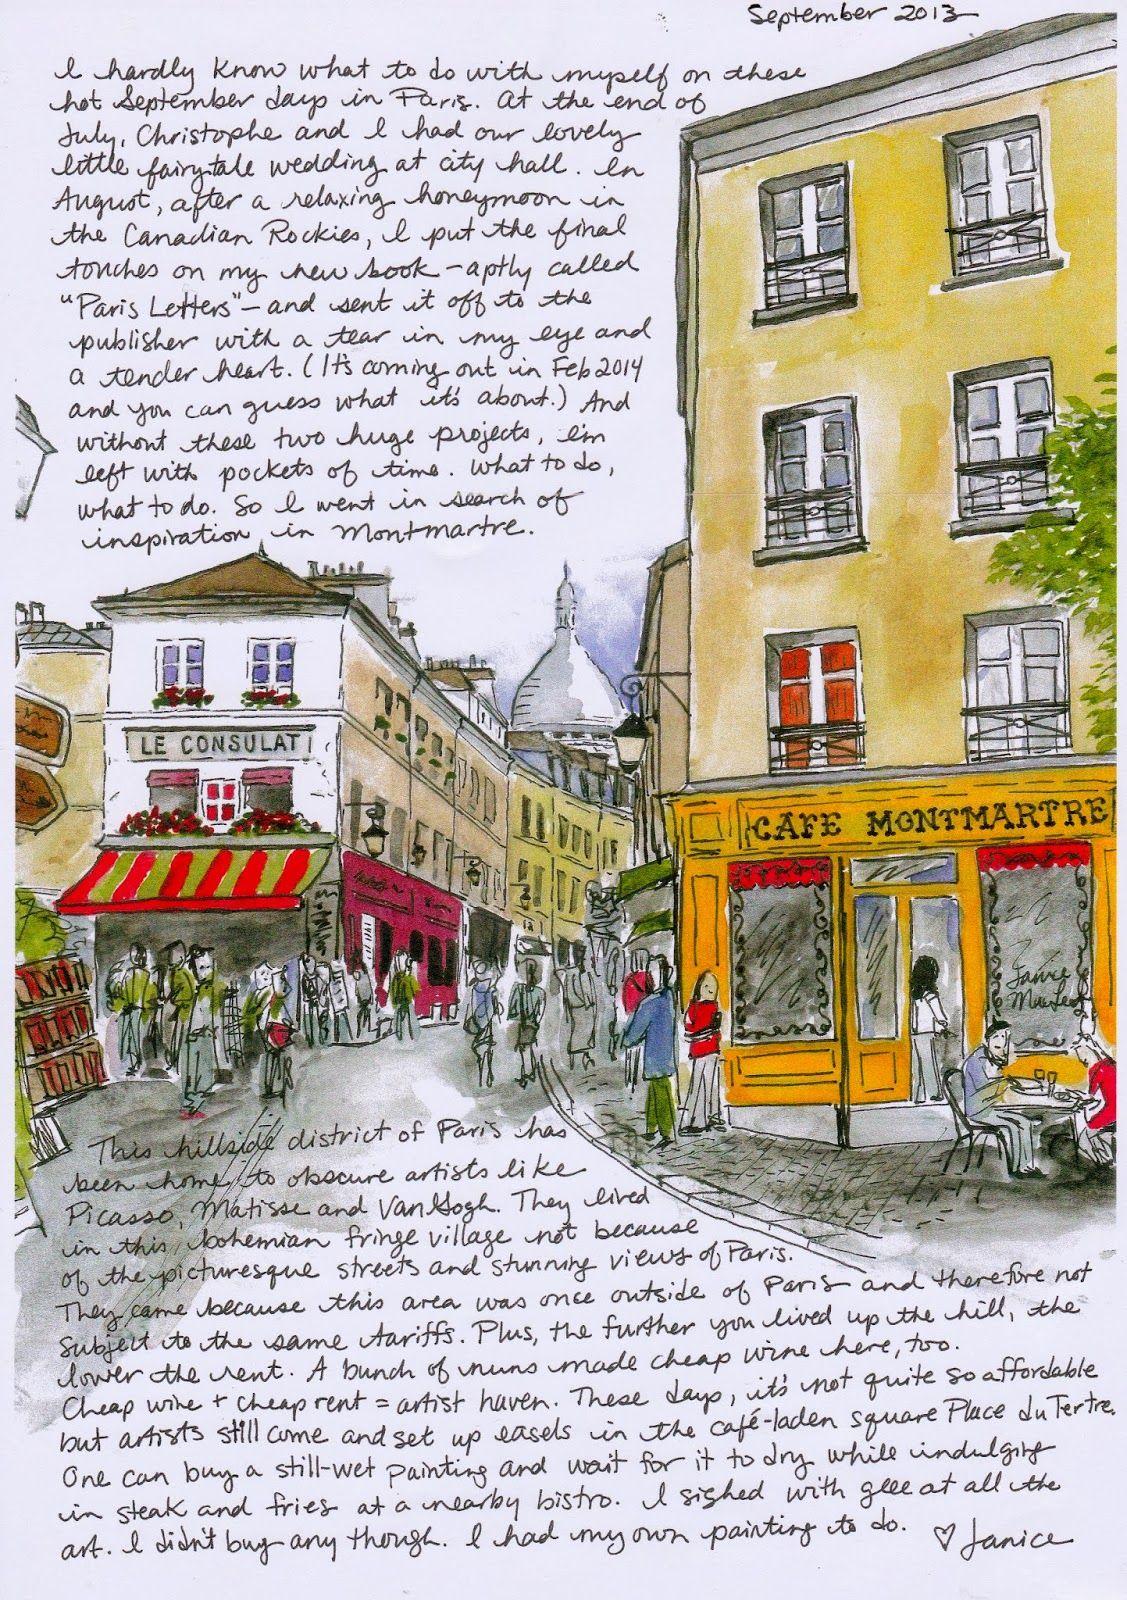 Paris Letters By Janice Macleod Arc Review Photo Contest